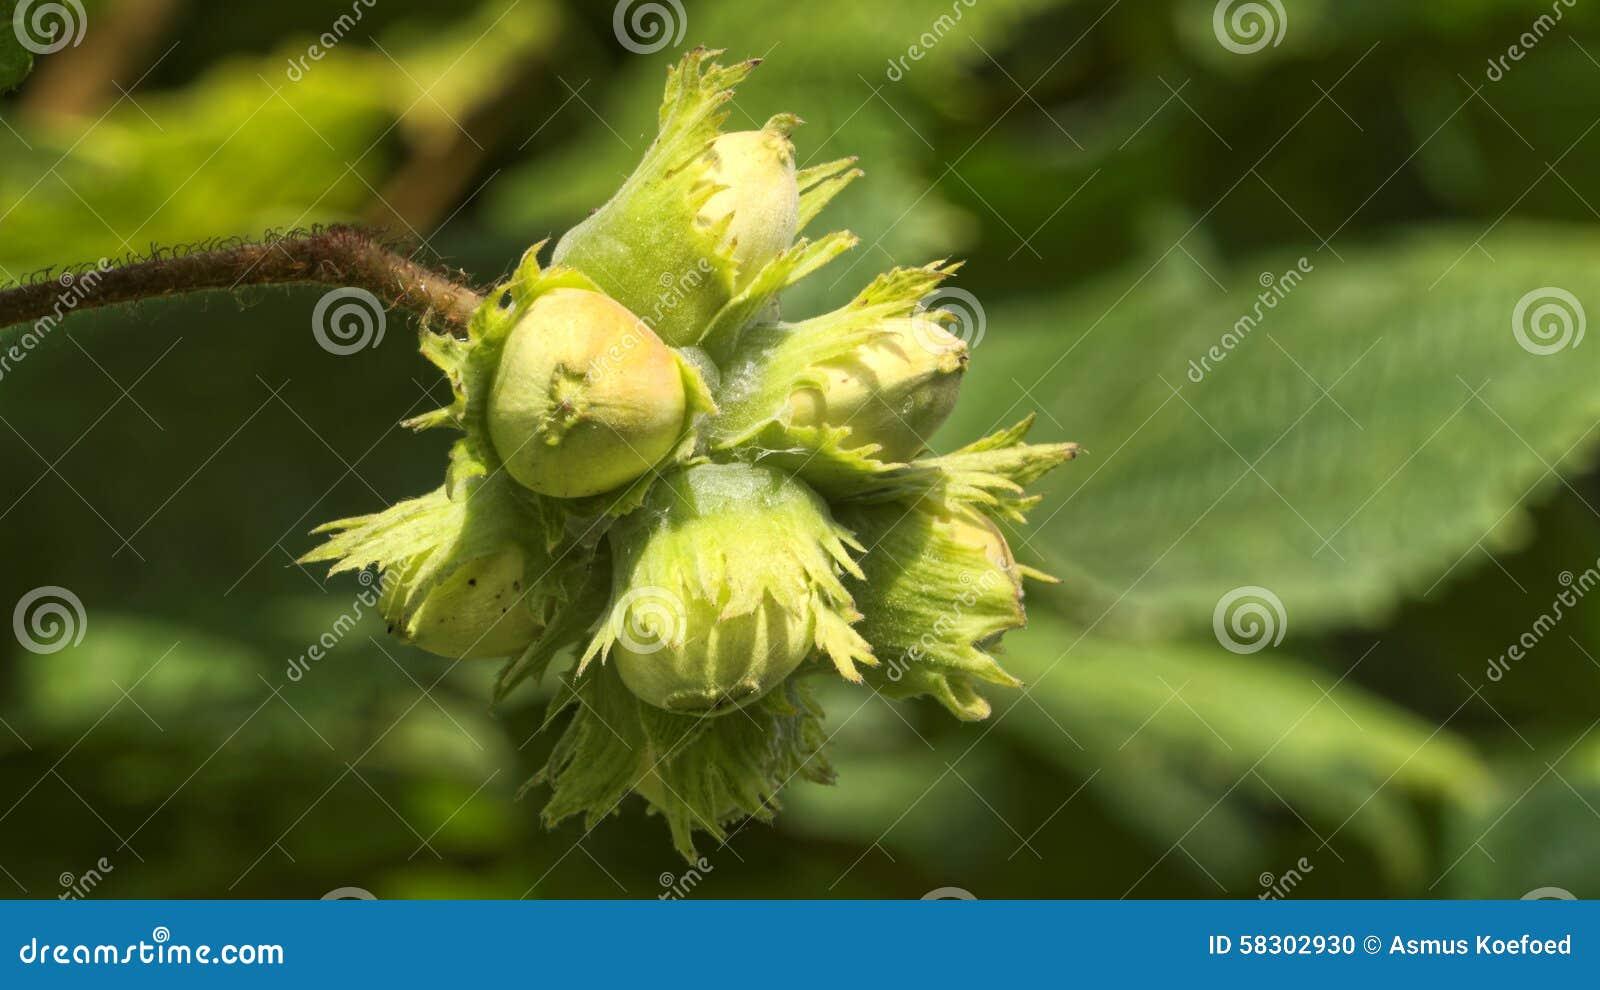 Hazelnuts on a hazel tree